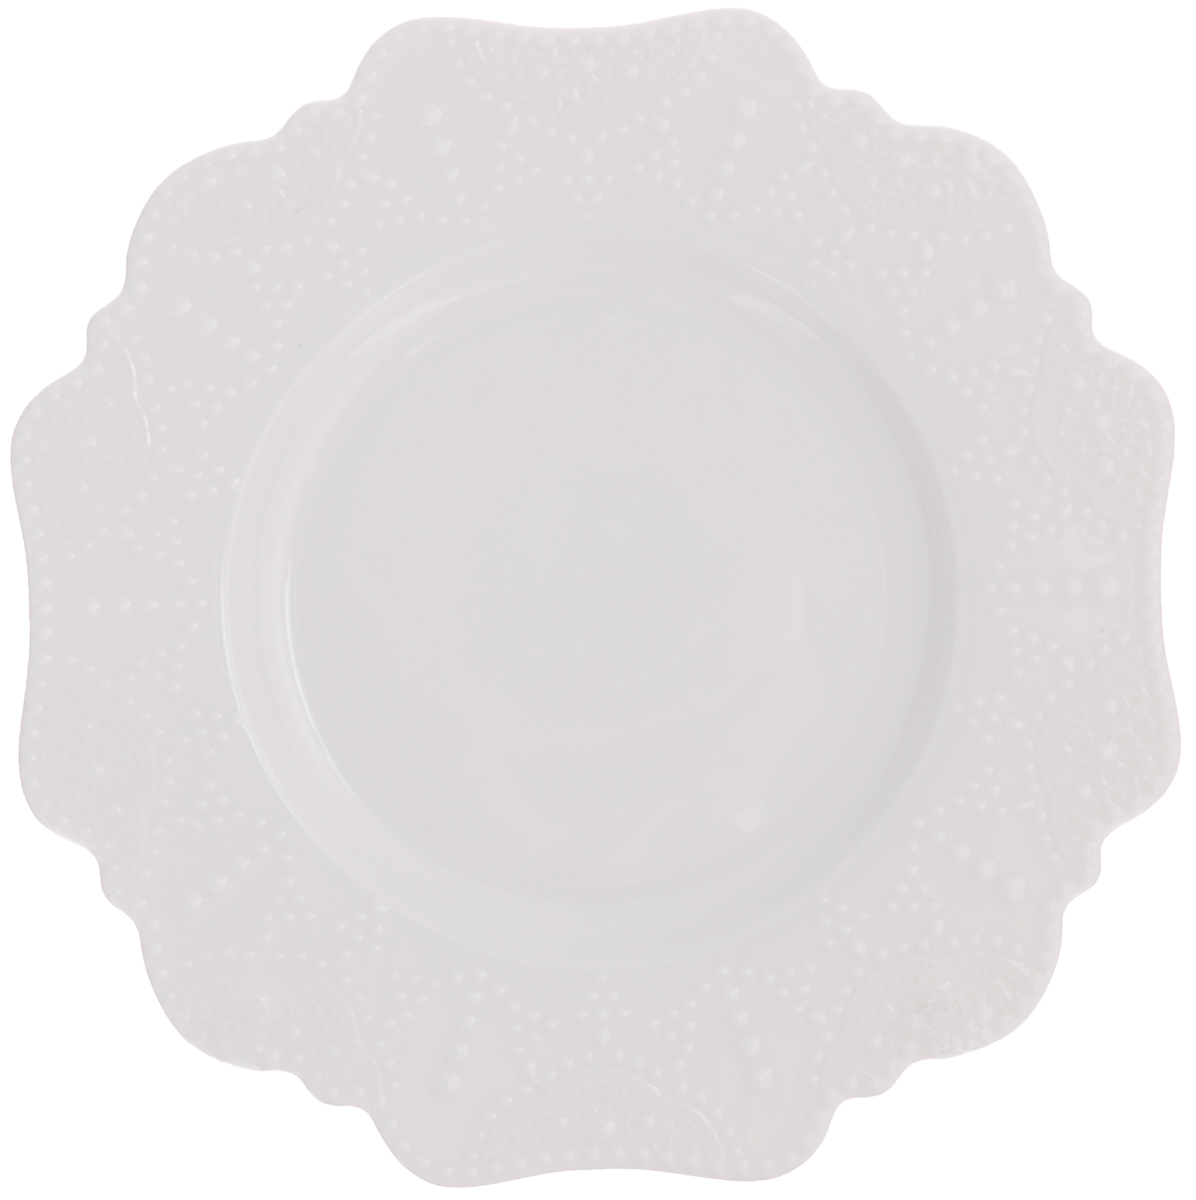 "Тарелка десертная Walmer ""Vivien"", цвет: белый, диаметр 21 см"